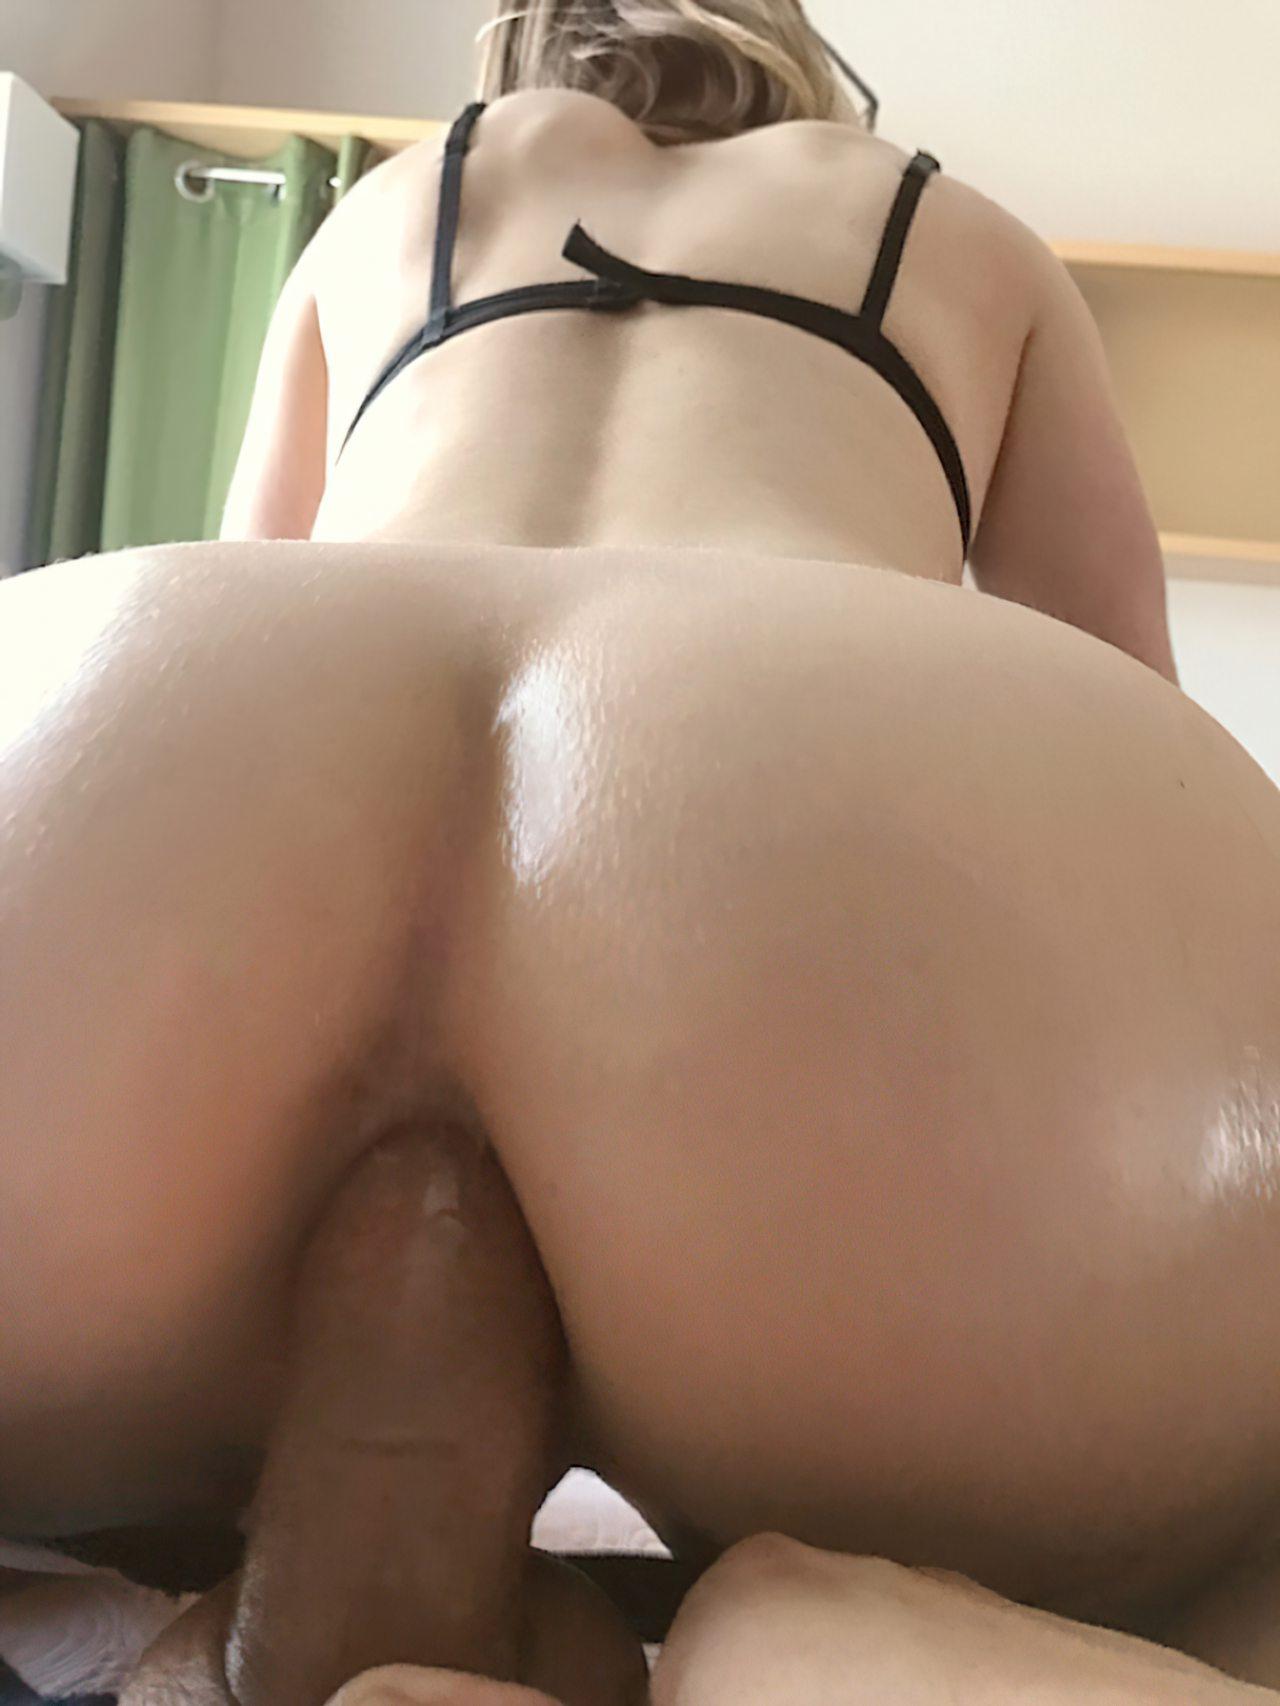 Sexo Anal Amadora Loirinha (15)